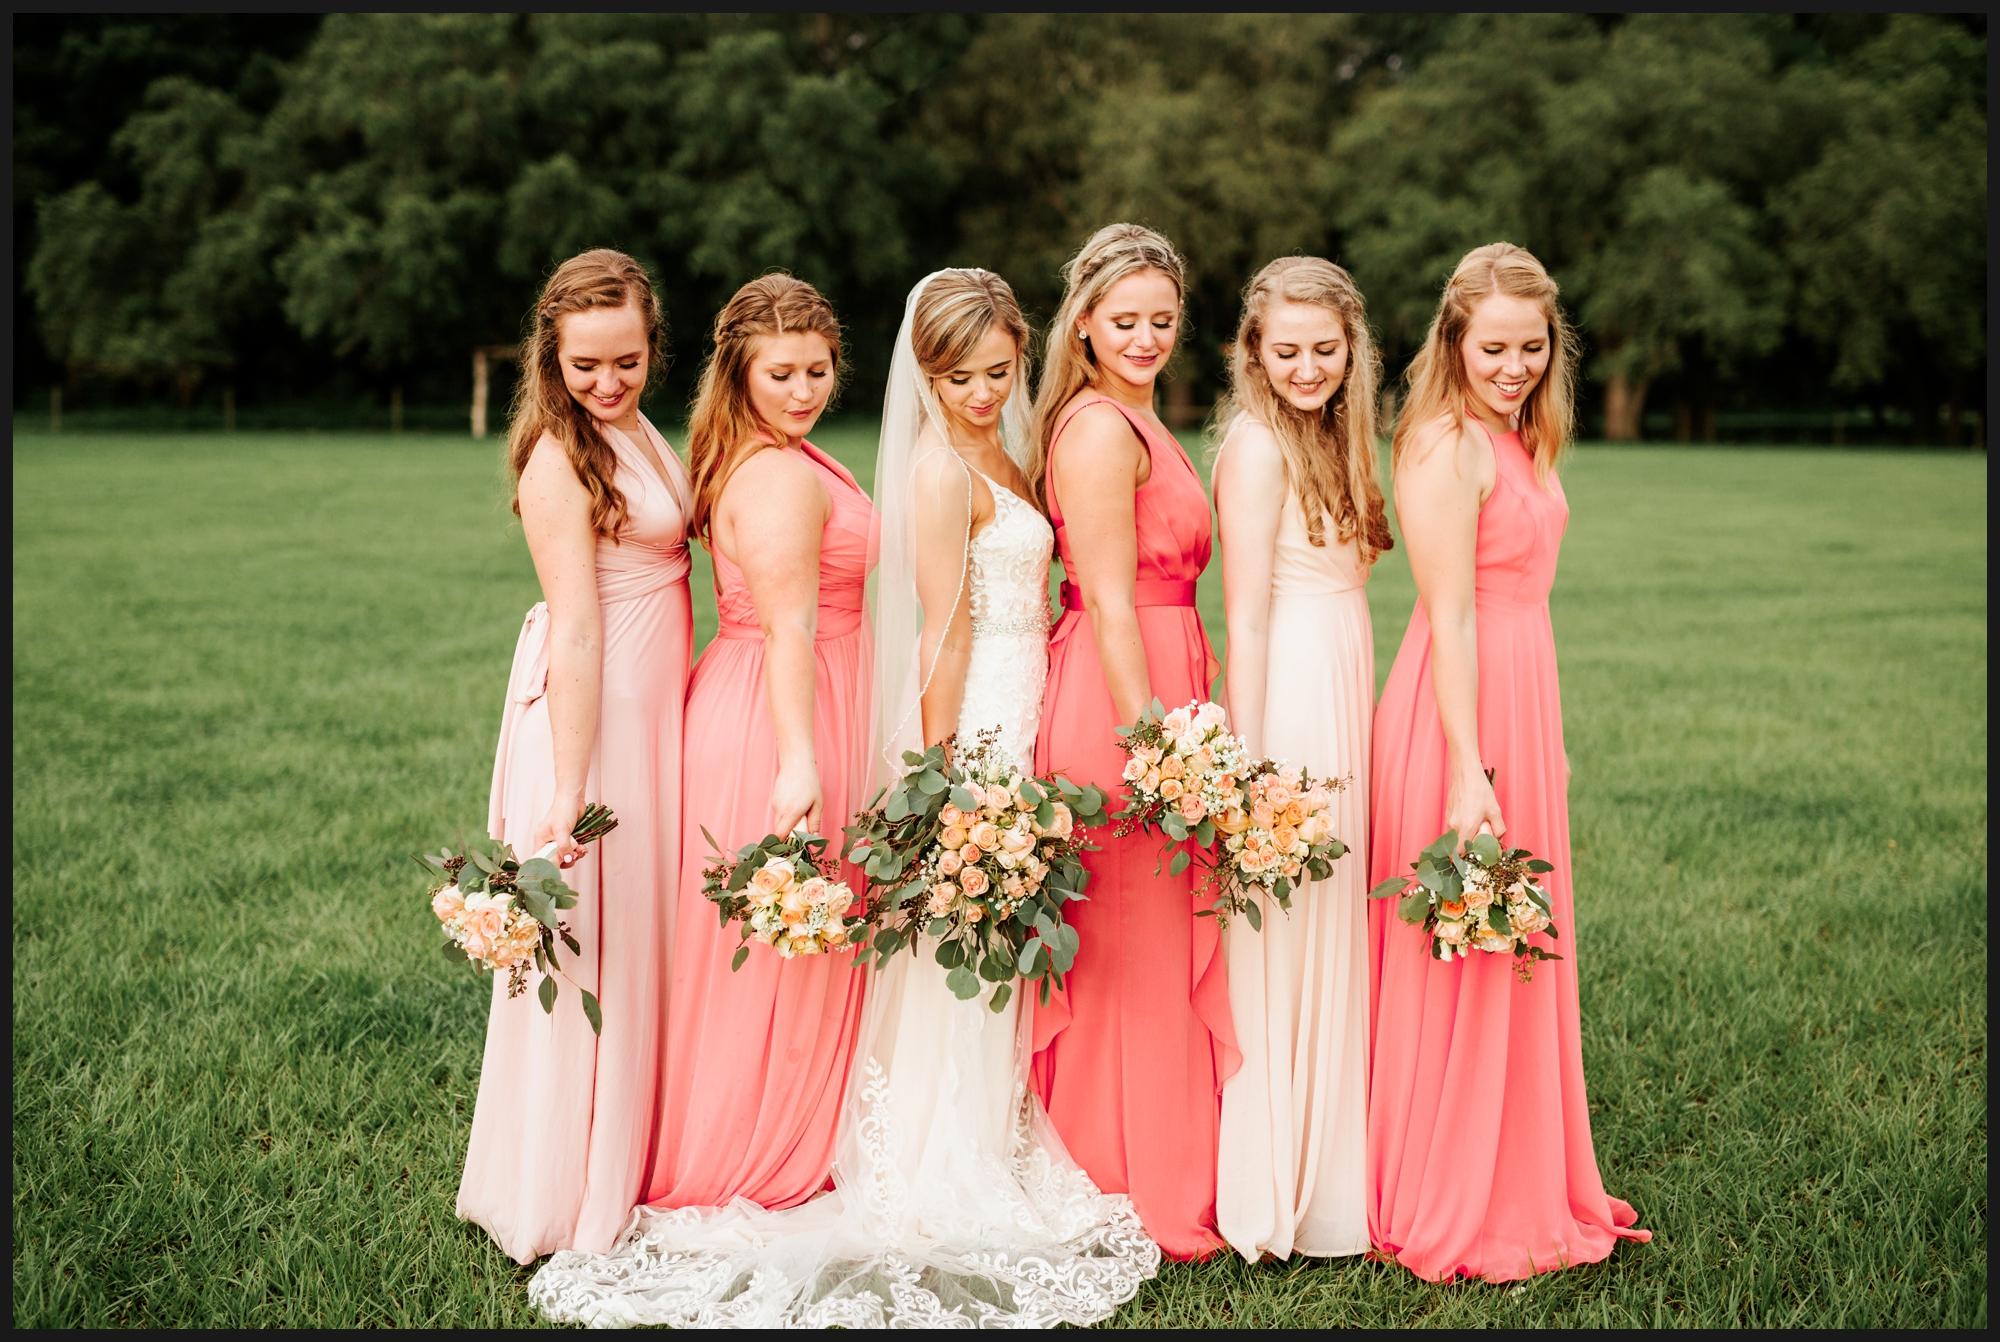 Orlando-Wedding-Photographer-destination-wedding-photographer-florida-wedding-photographer-hawaii-wedding-photographer_0318.jpg